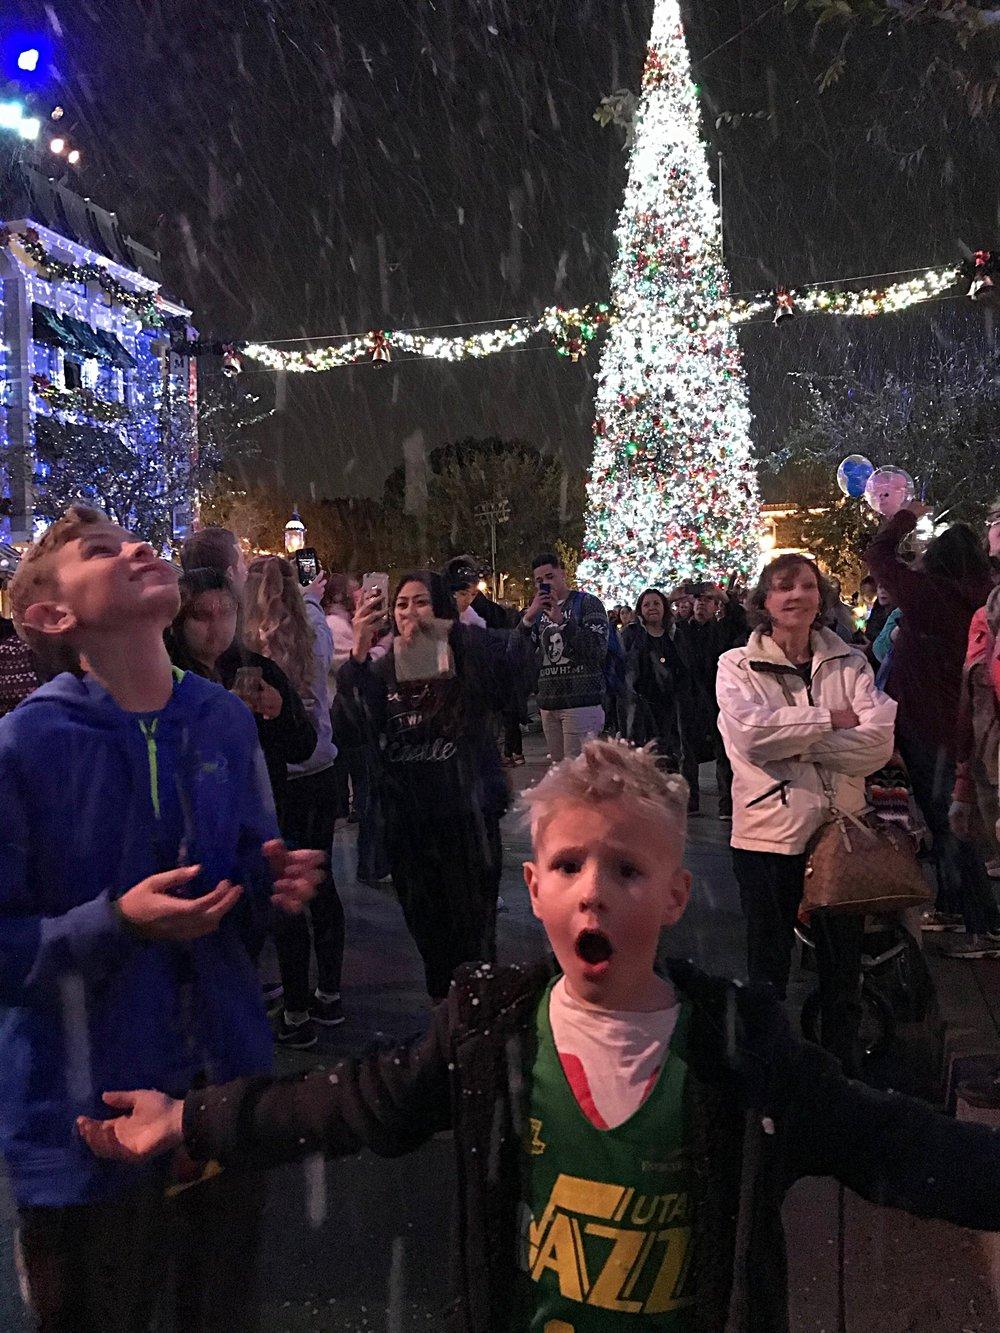 Snow at Disneyland